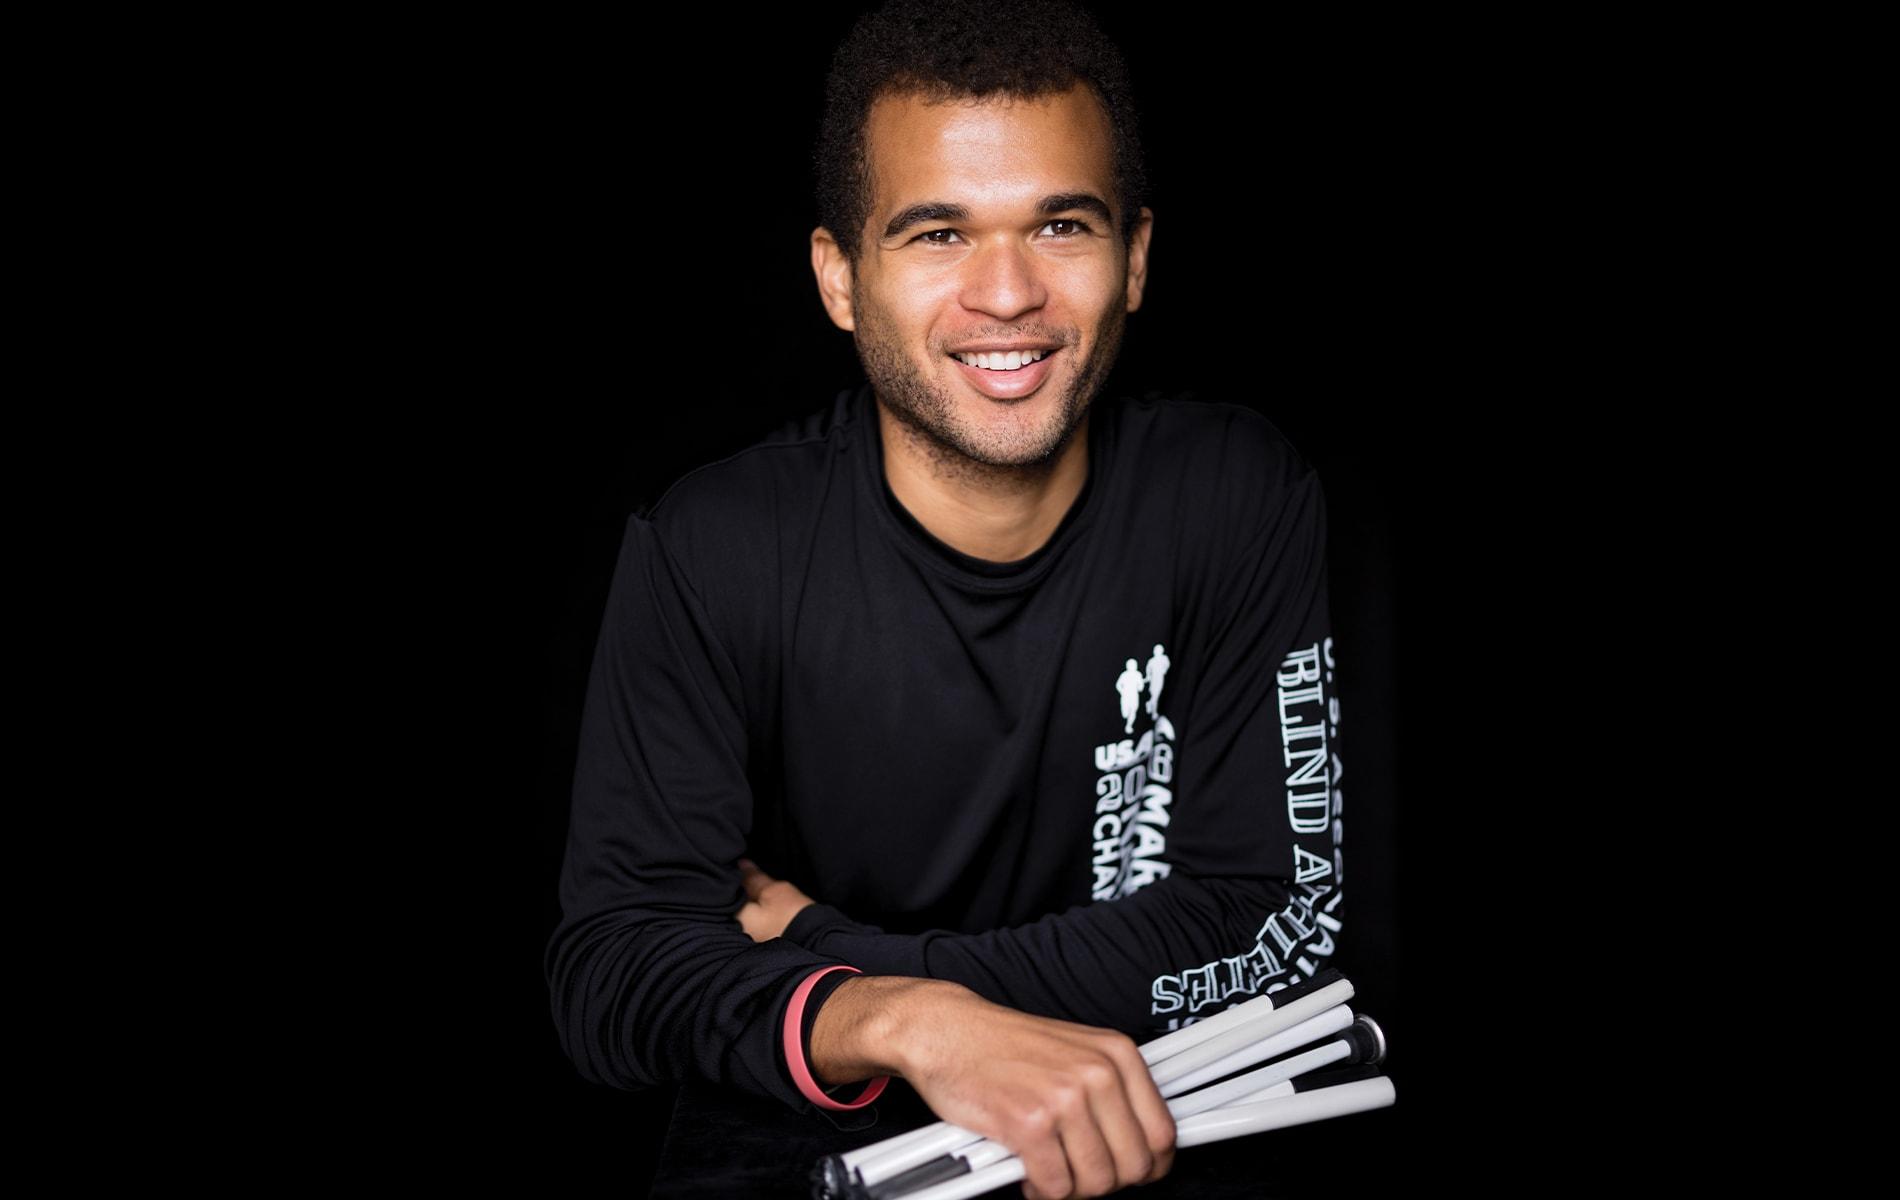 Olympic runner Chaz Davis